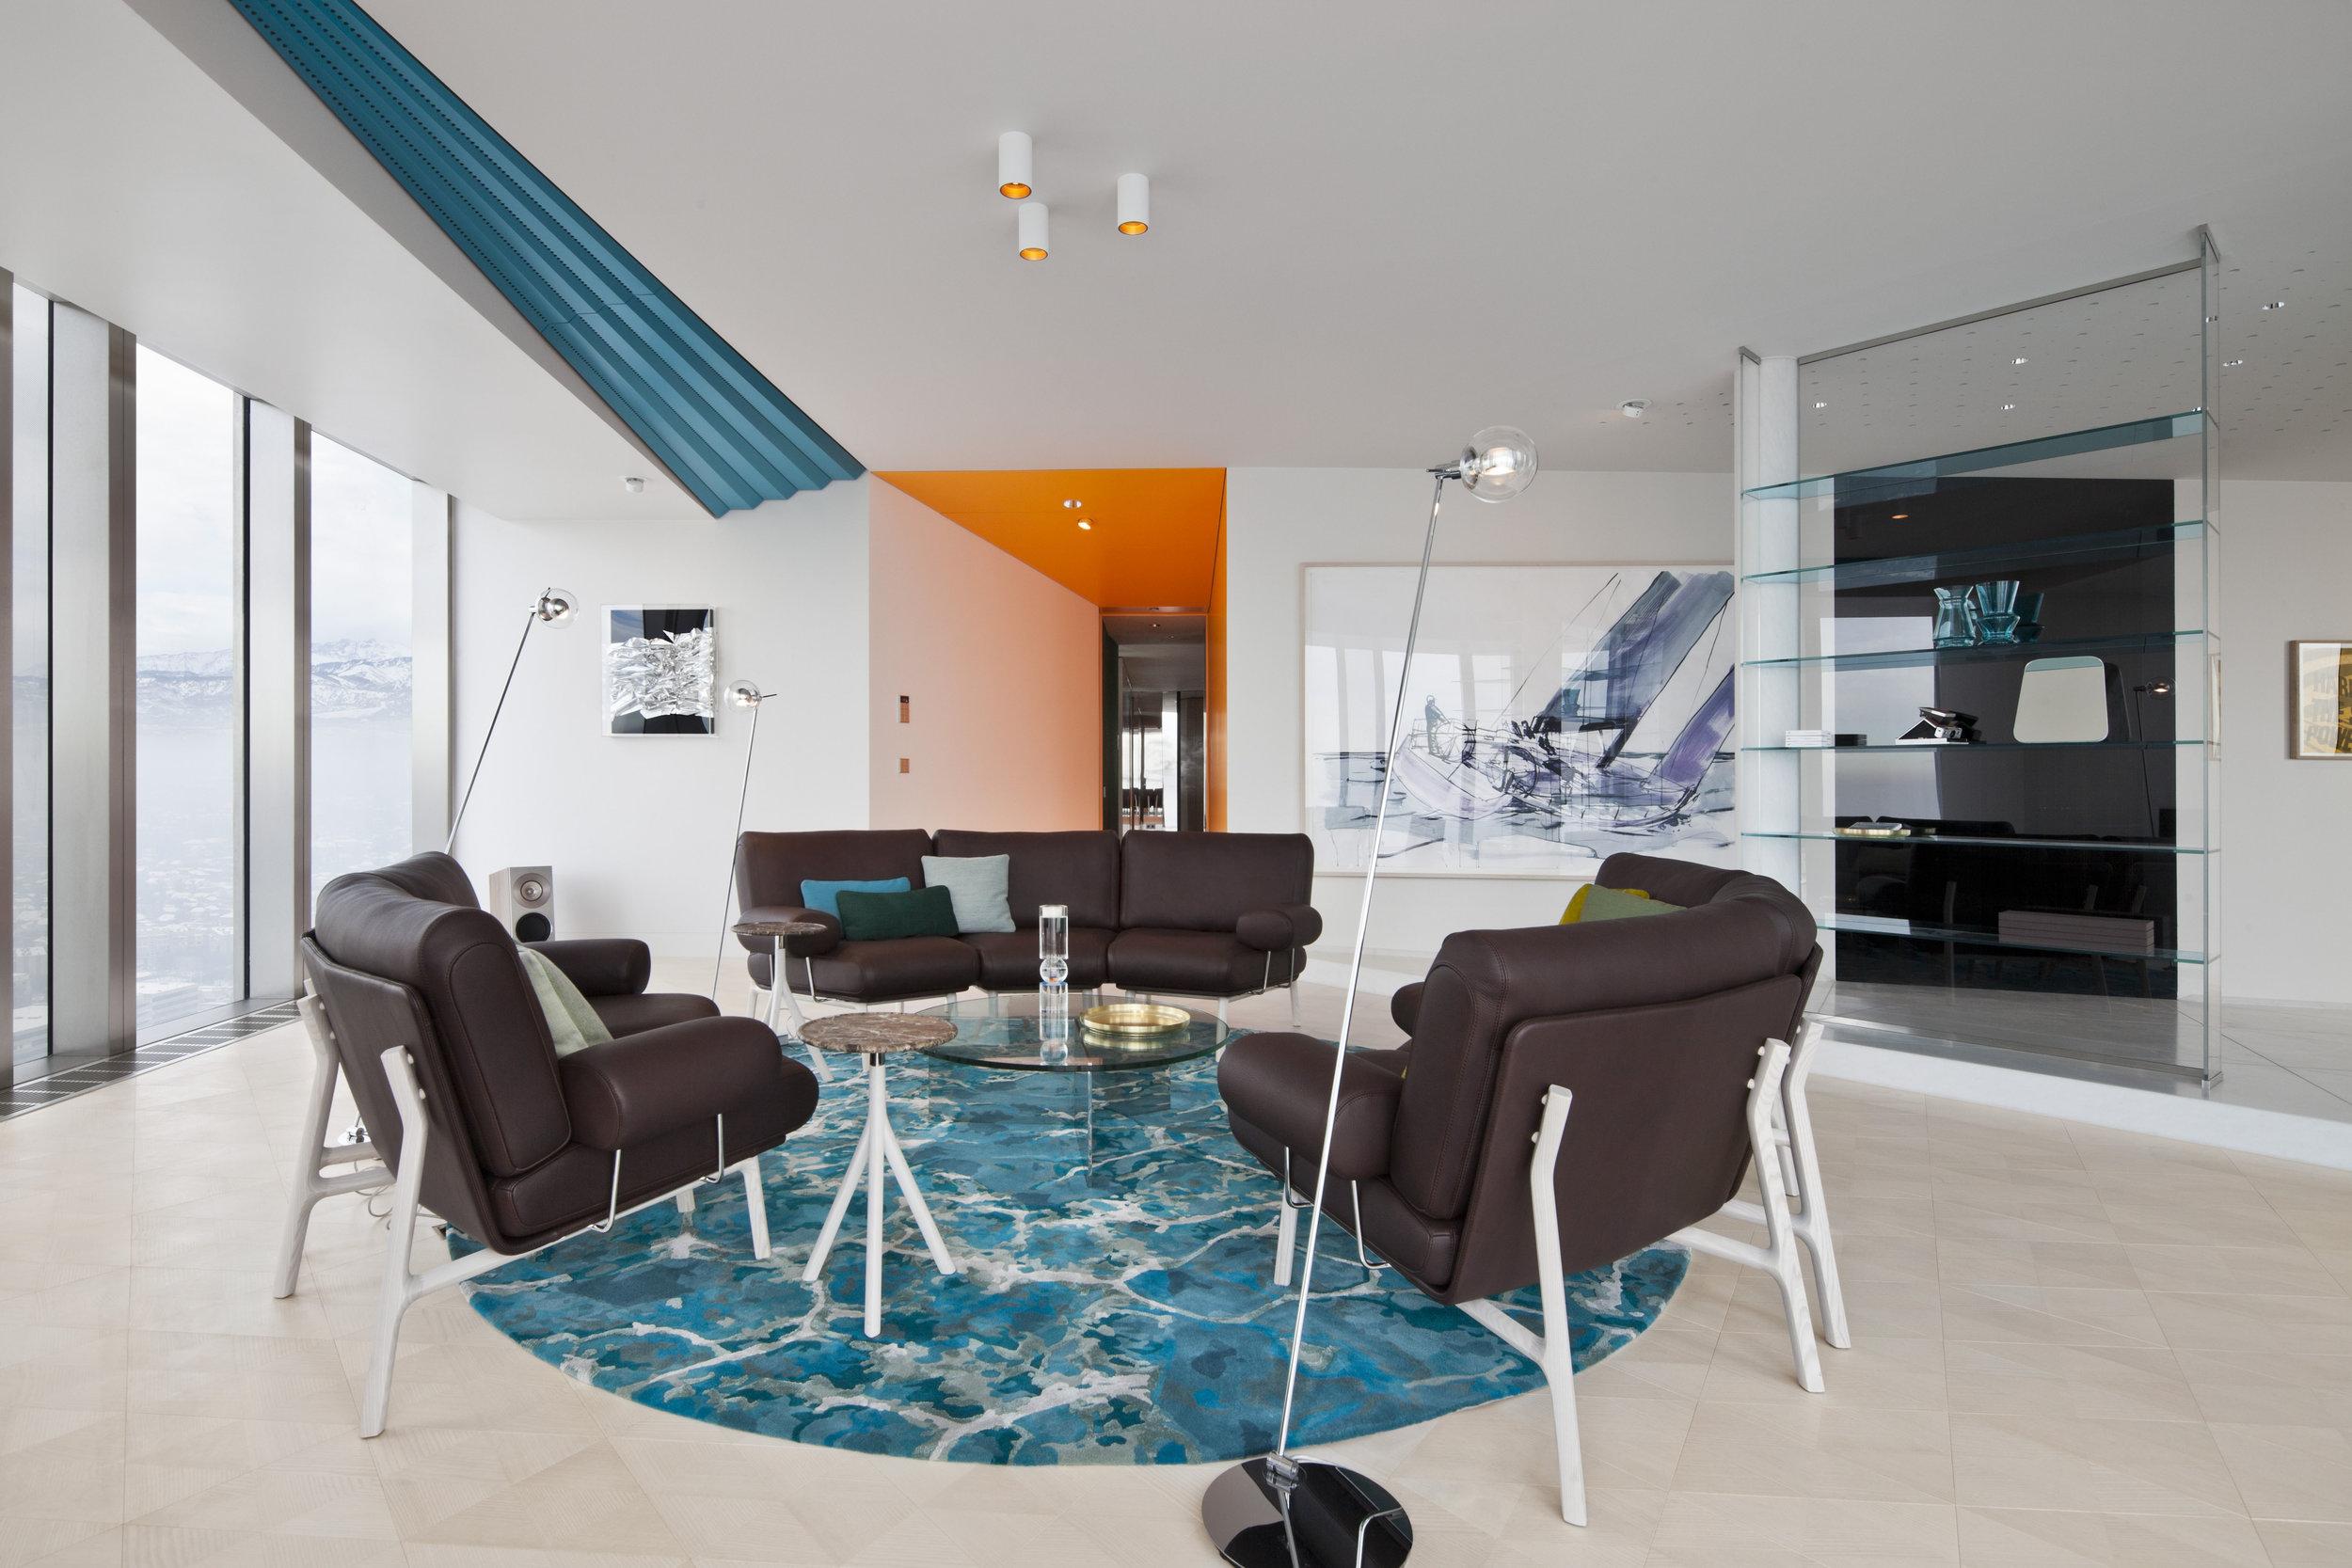 ritz-apartment_private-interior-design_coordination-berlin_03.jpg